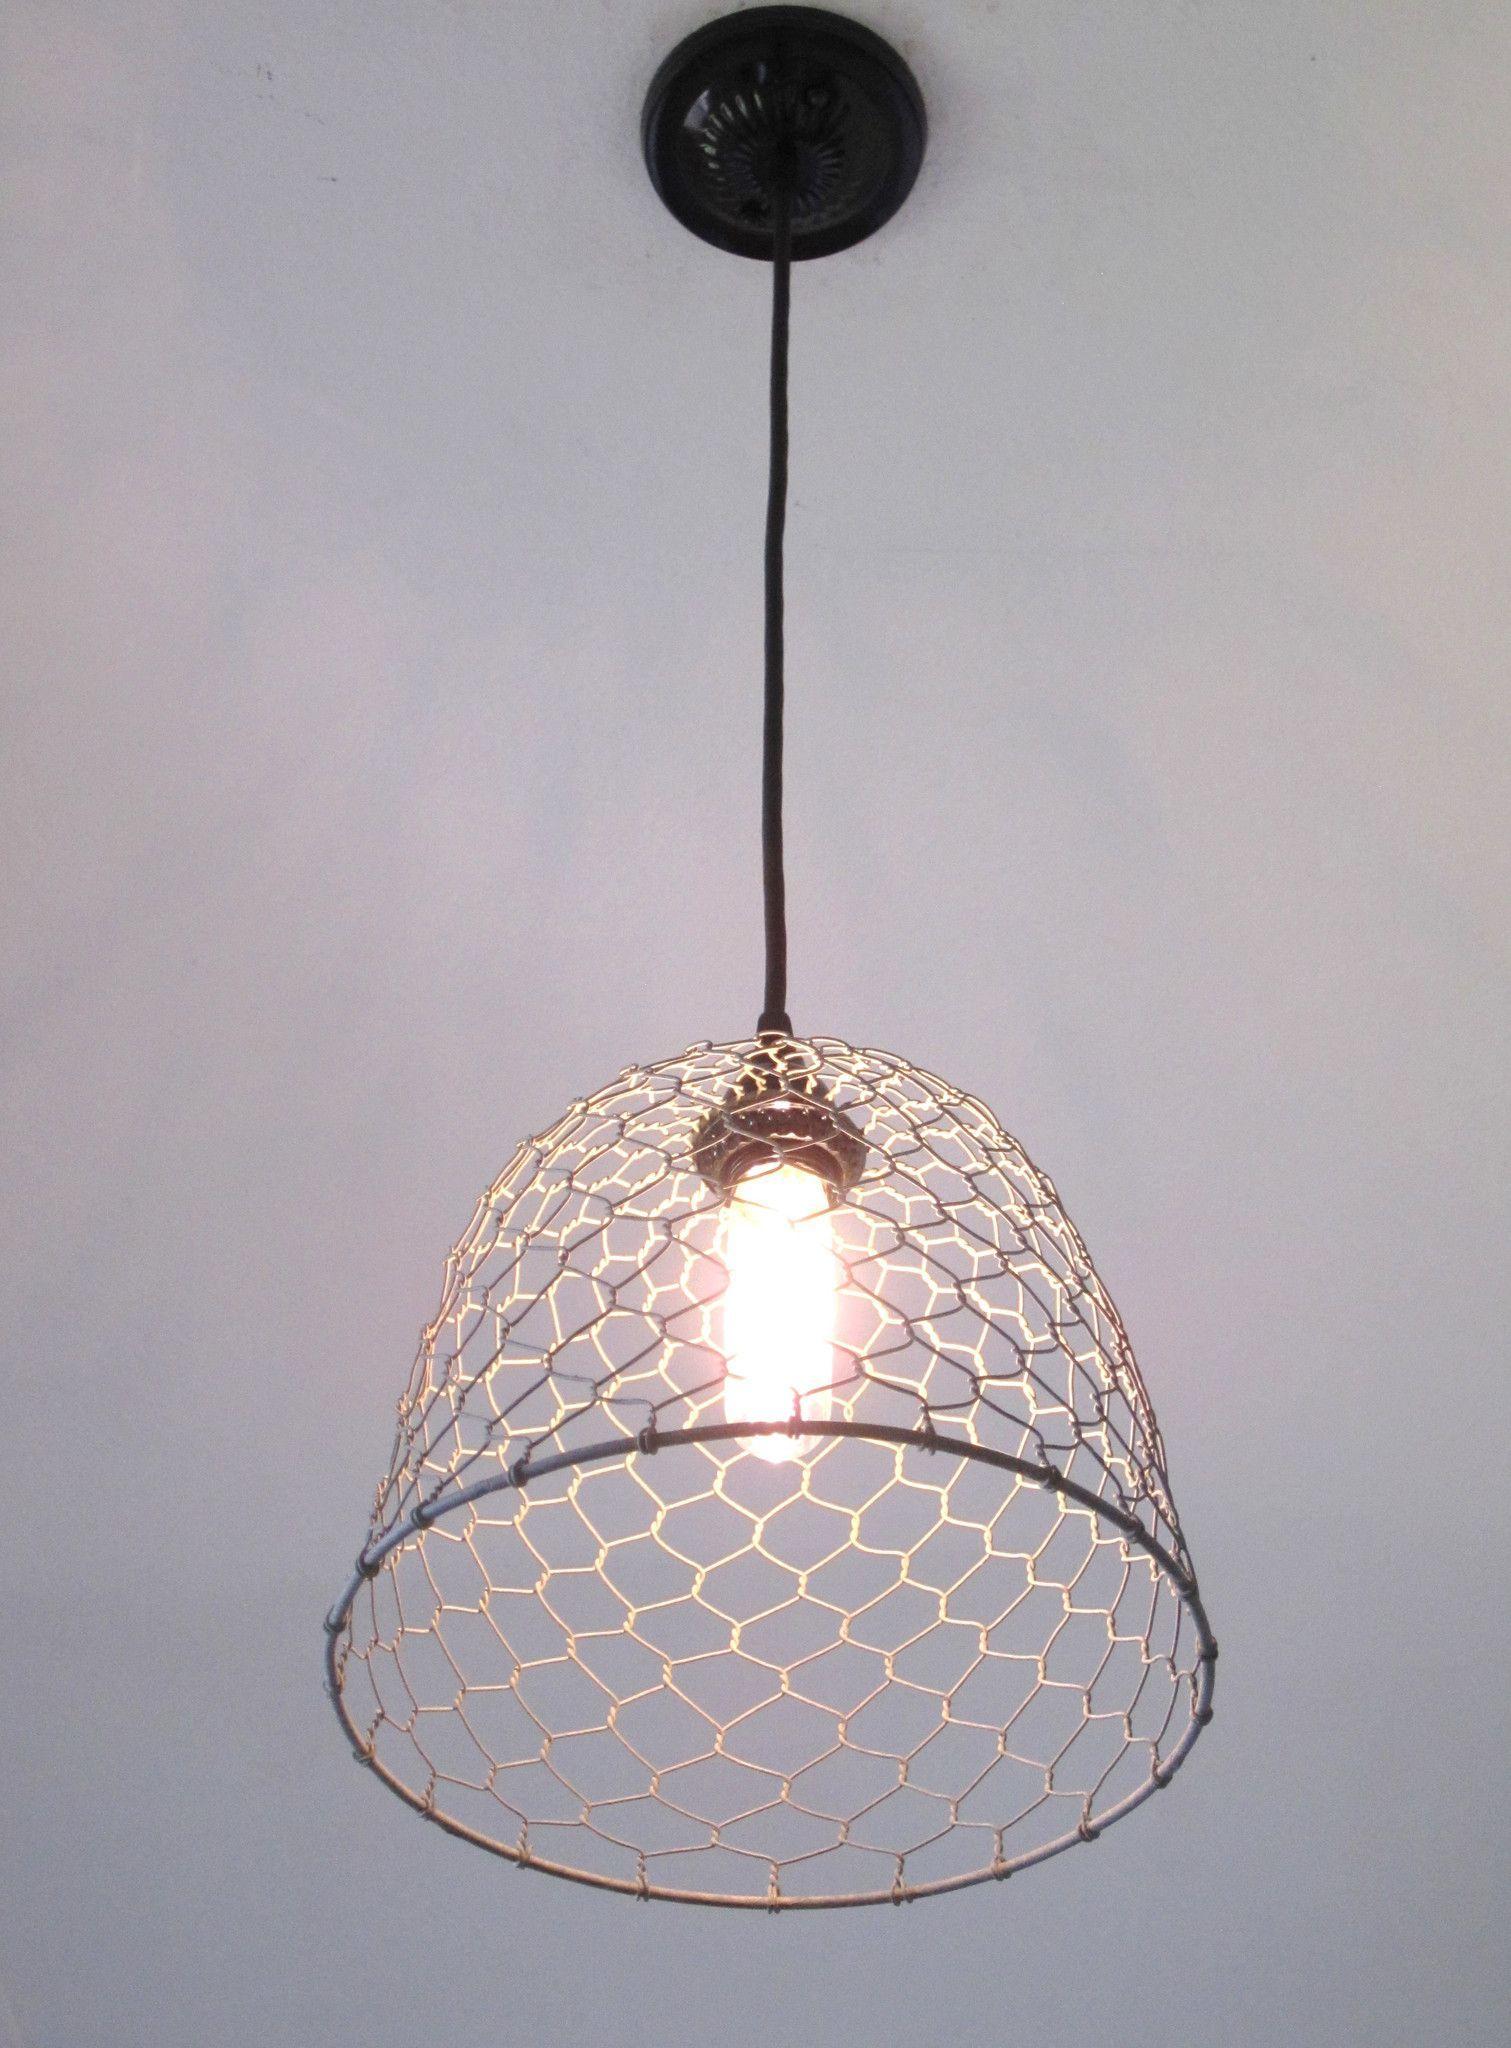 Galvanized Chicken Wire Dome Pendant Light | Chicken wire, Pendants ...